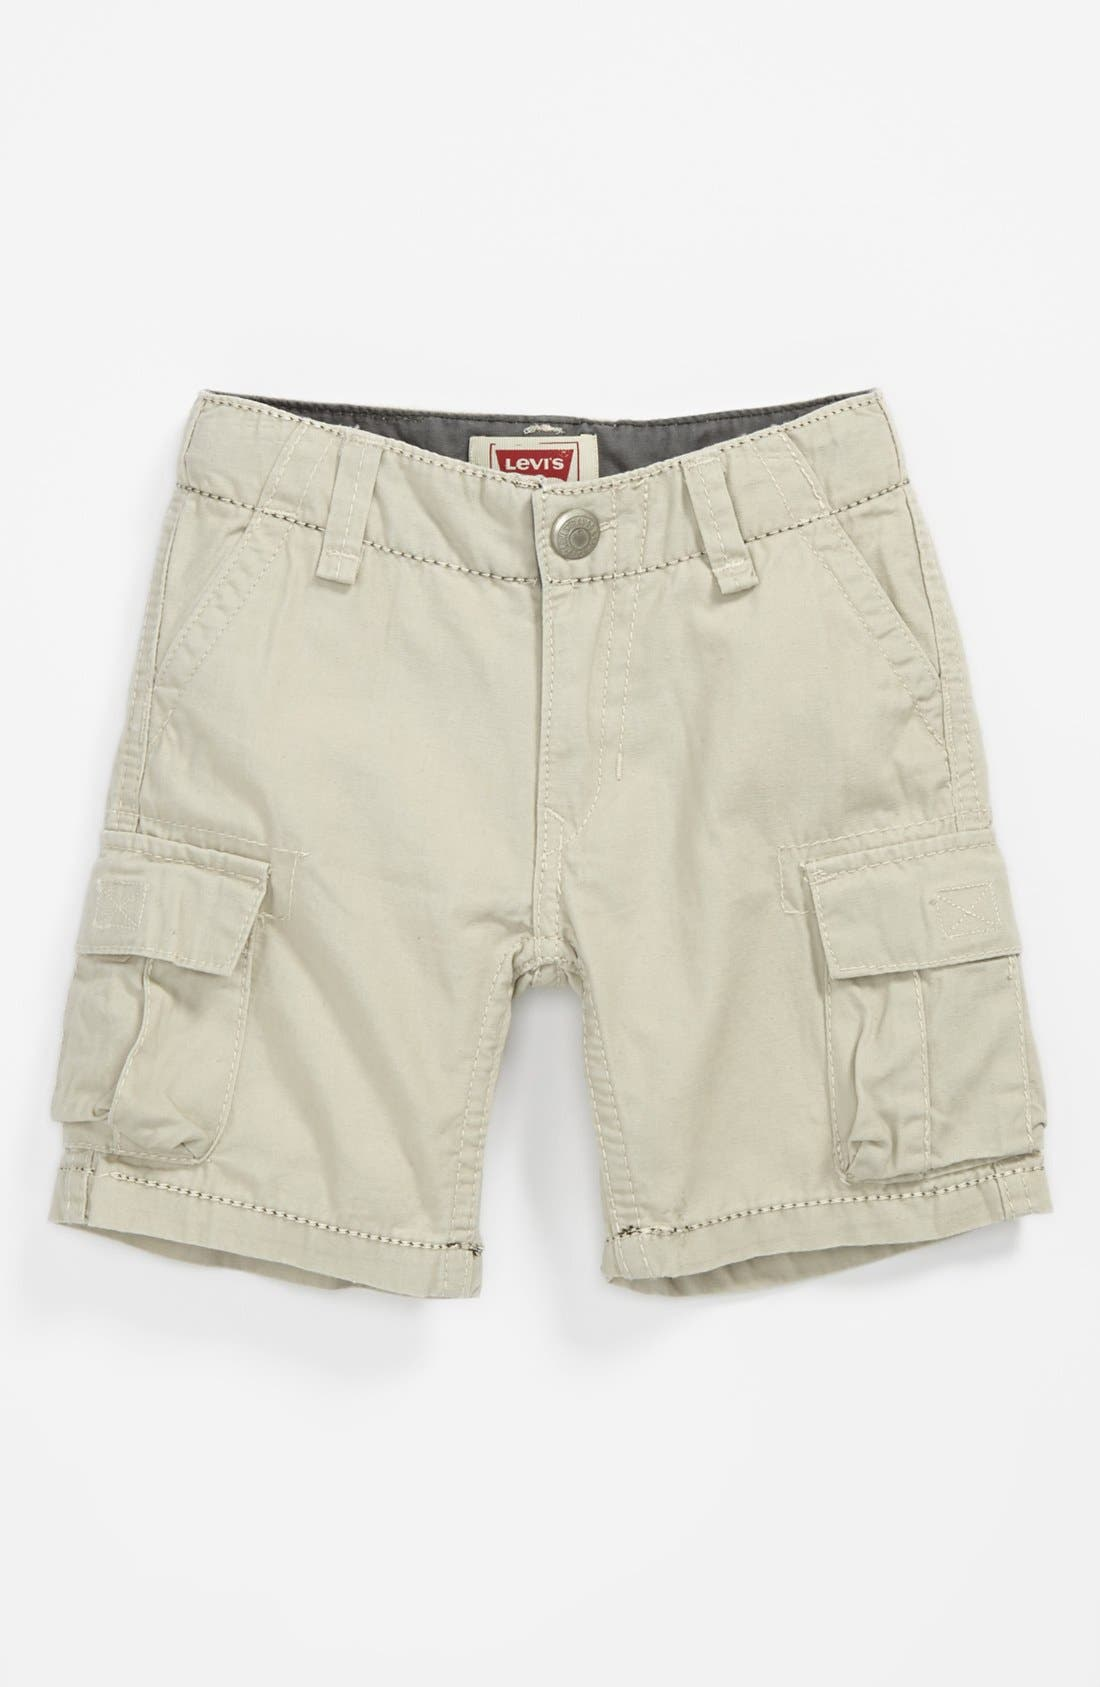 Main Image - Levi's® 'Troop' Cargo Shorts (Toddler Boys)